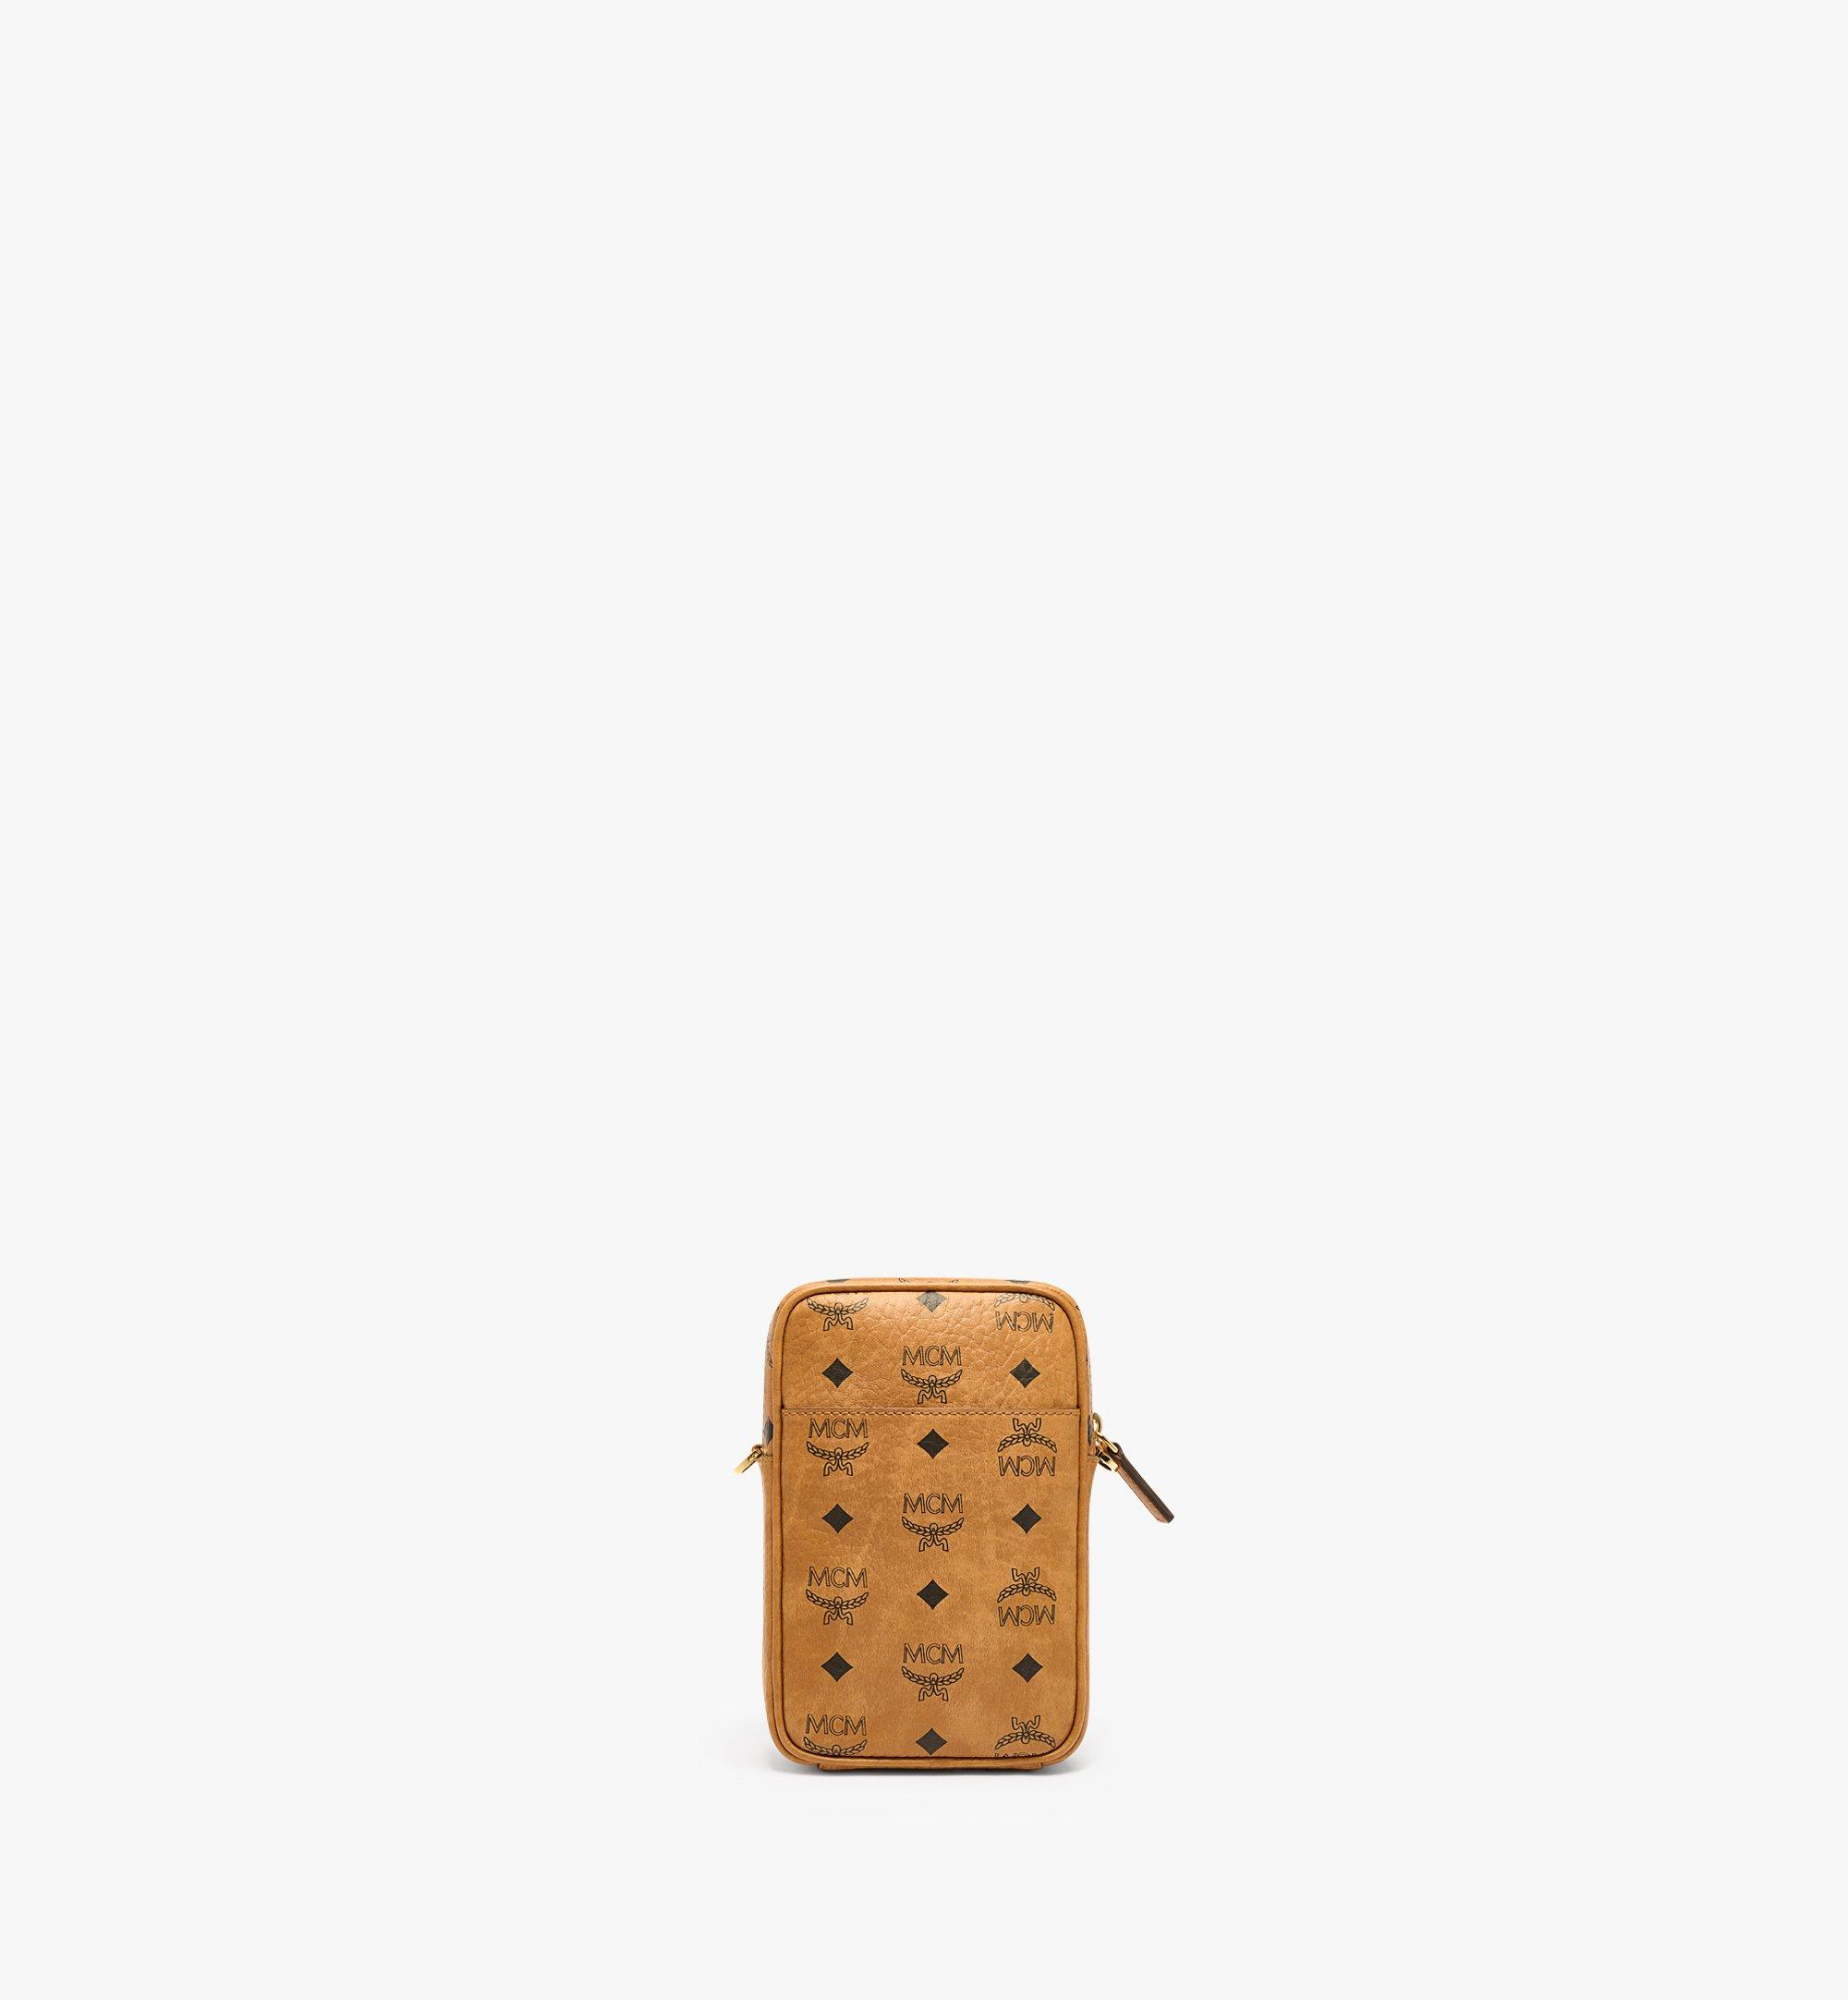 MCM N/S Crossbody Bag in Visetos Original Cognac MMRAAVI01CO001 Alternate View 3